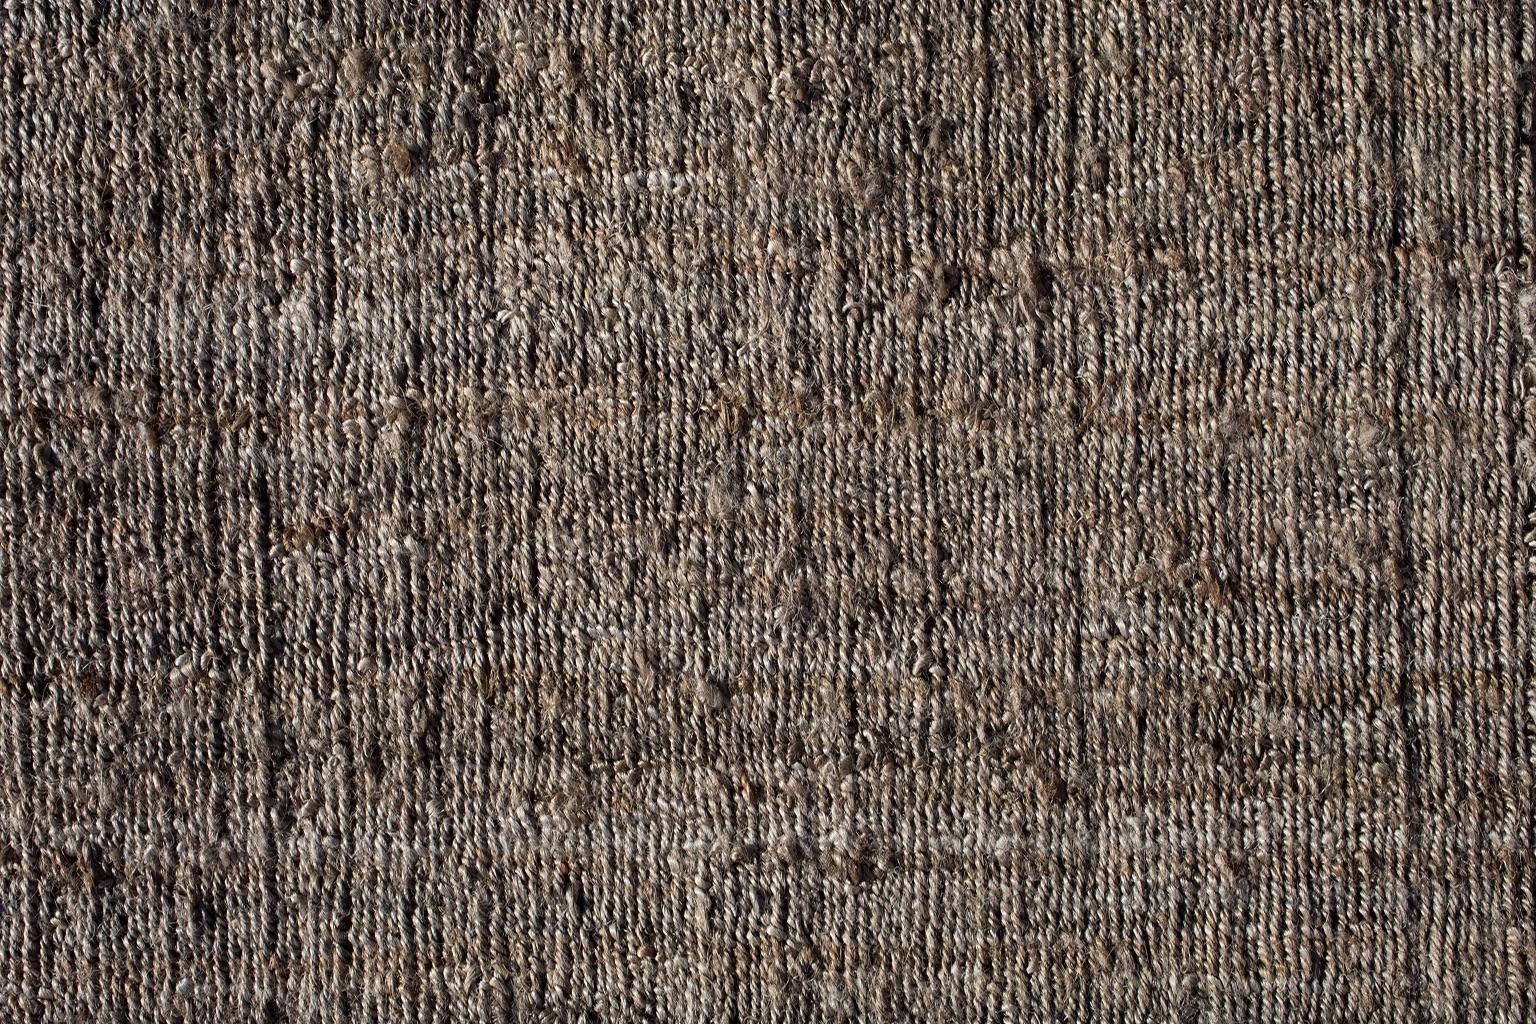 C&CMilano-Electra-carpet